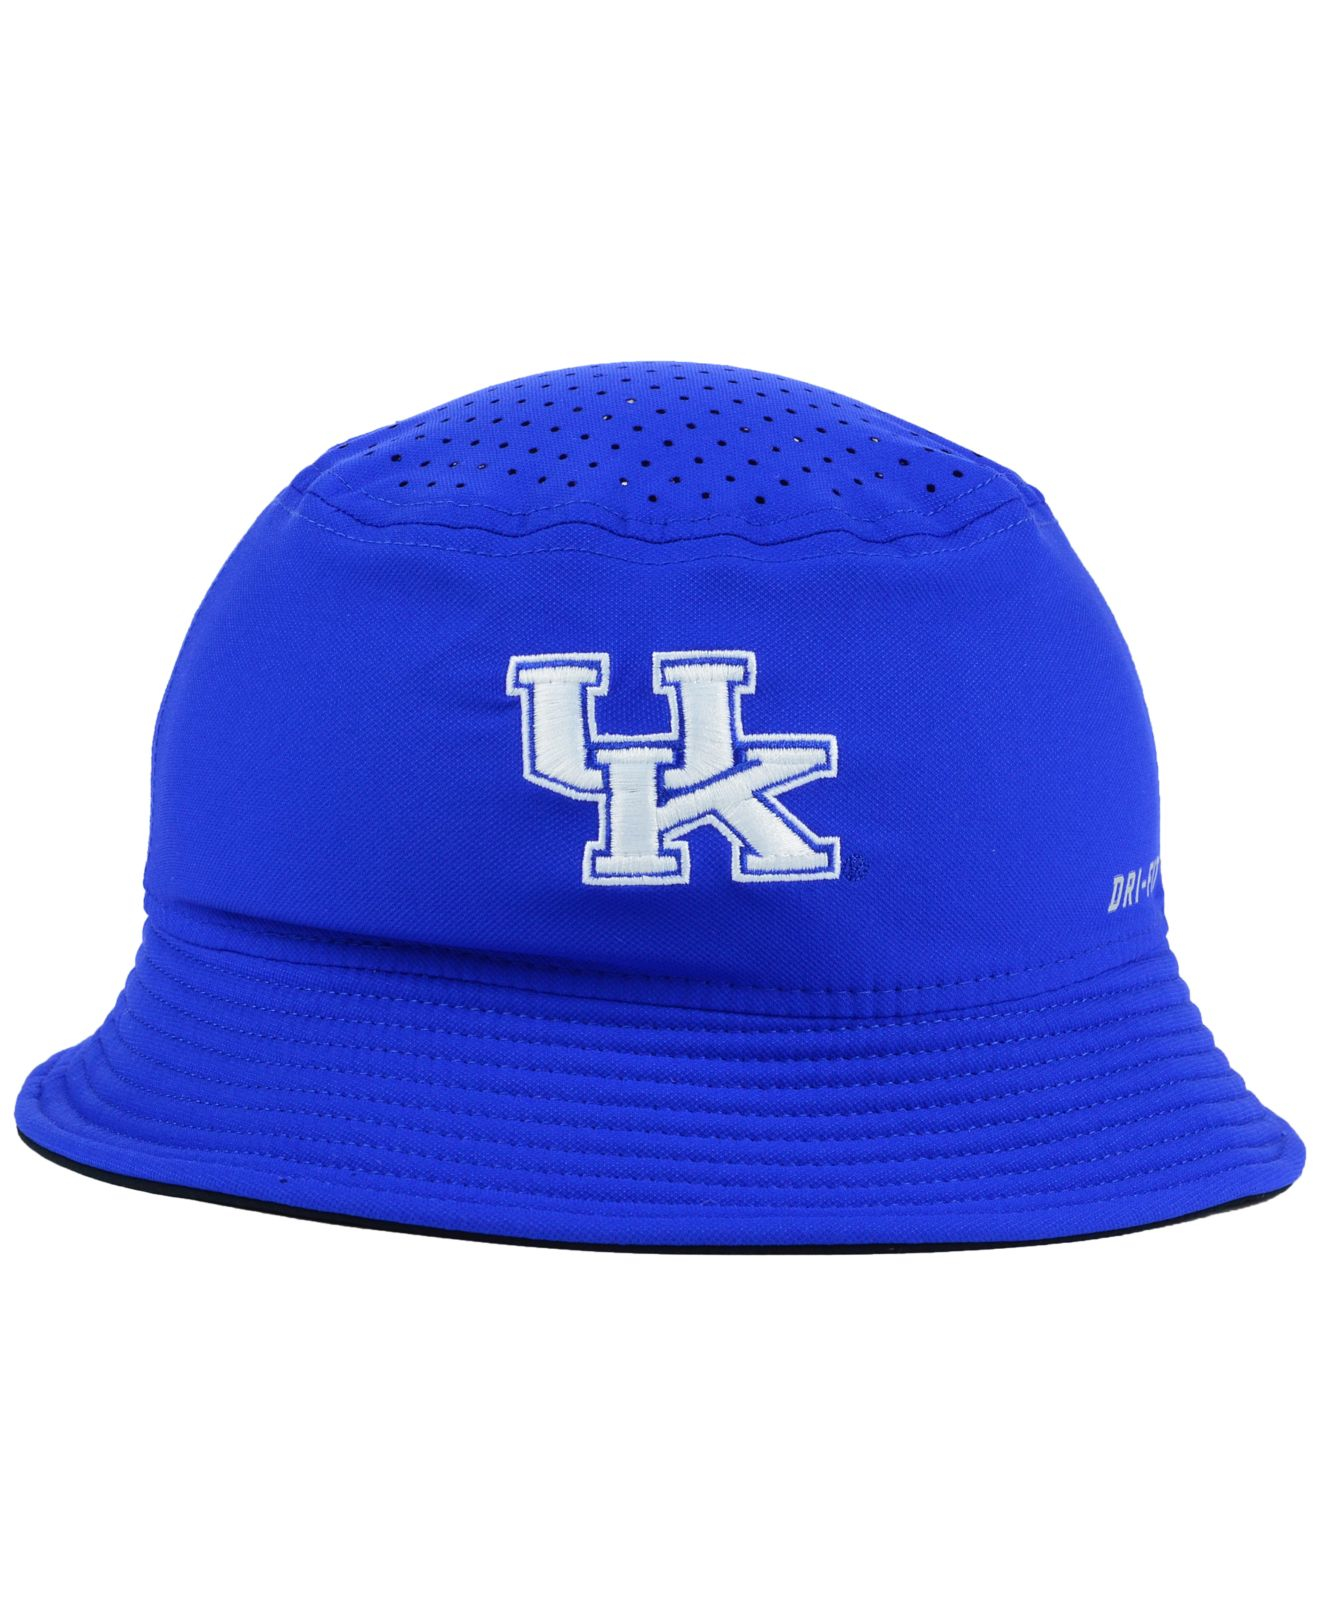 dc53065b423eb9 Lyst - Nike Kentucky Wildcats Vapor Bucket Hat in Blue for Men